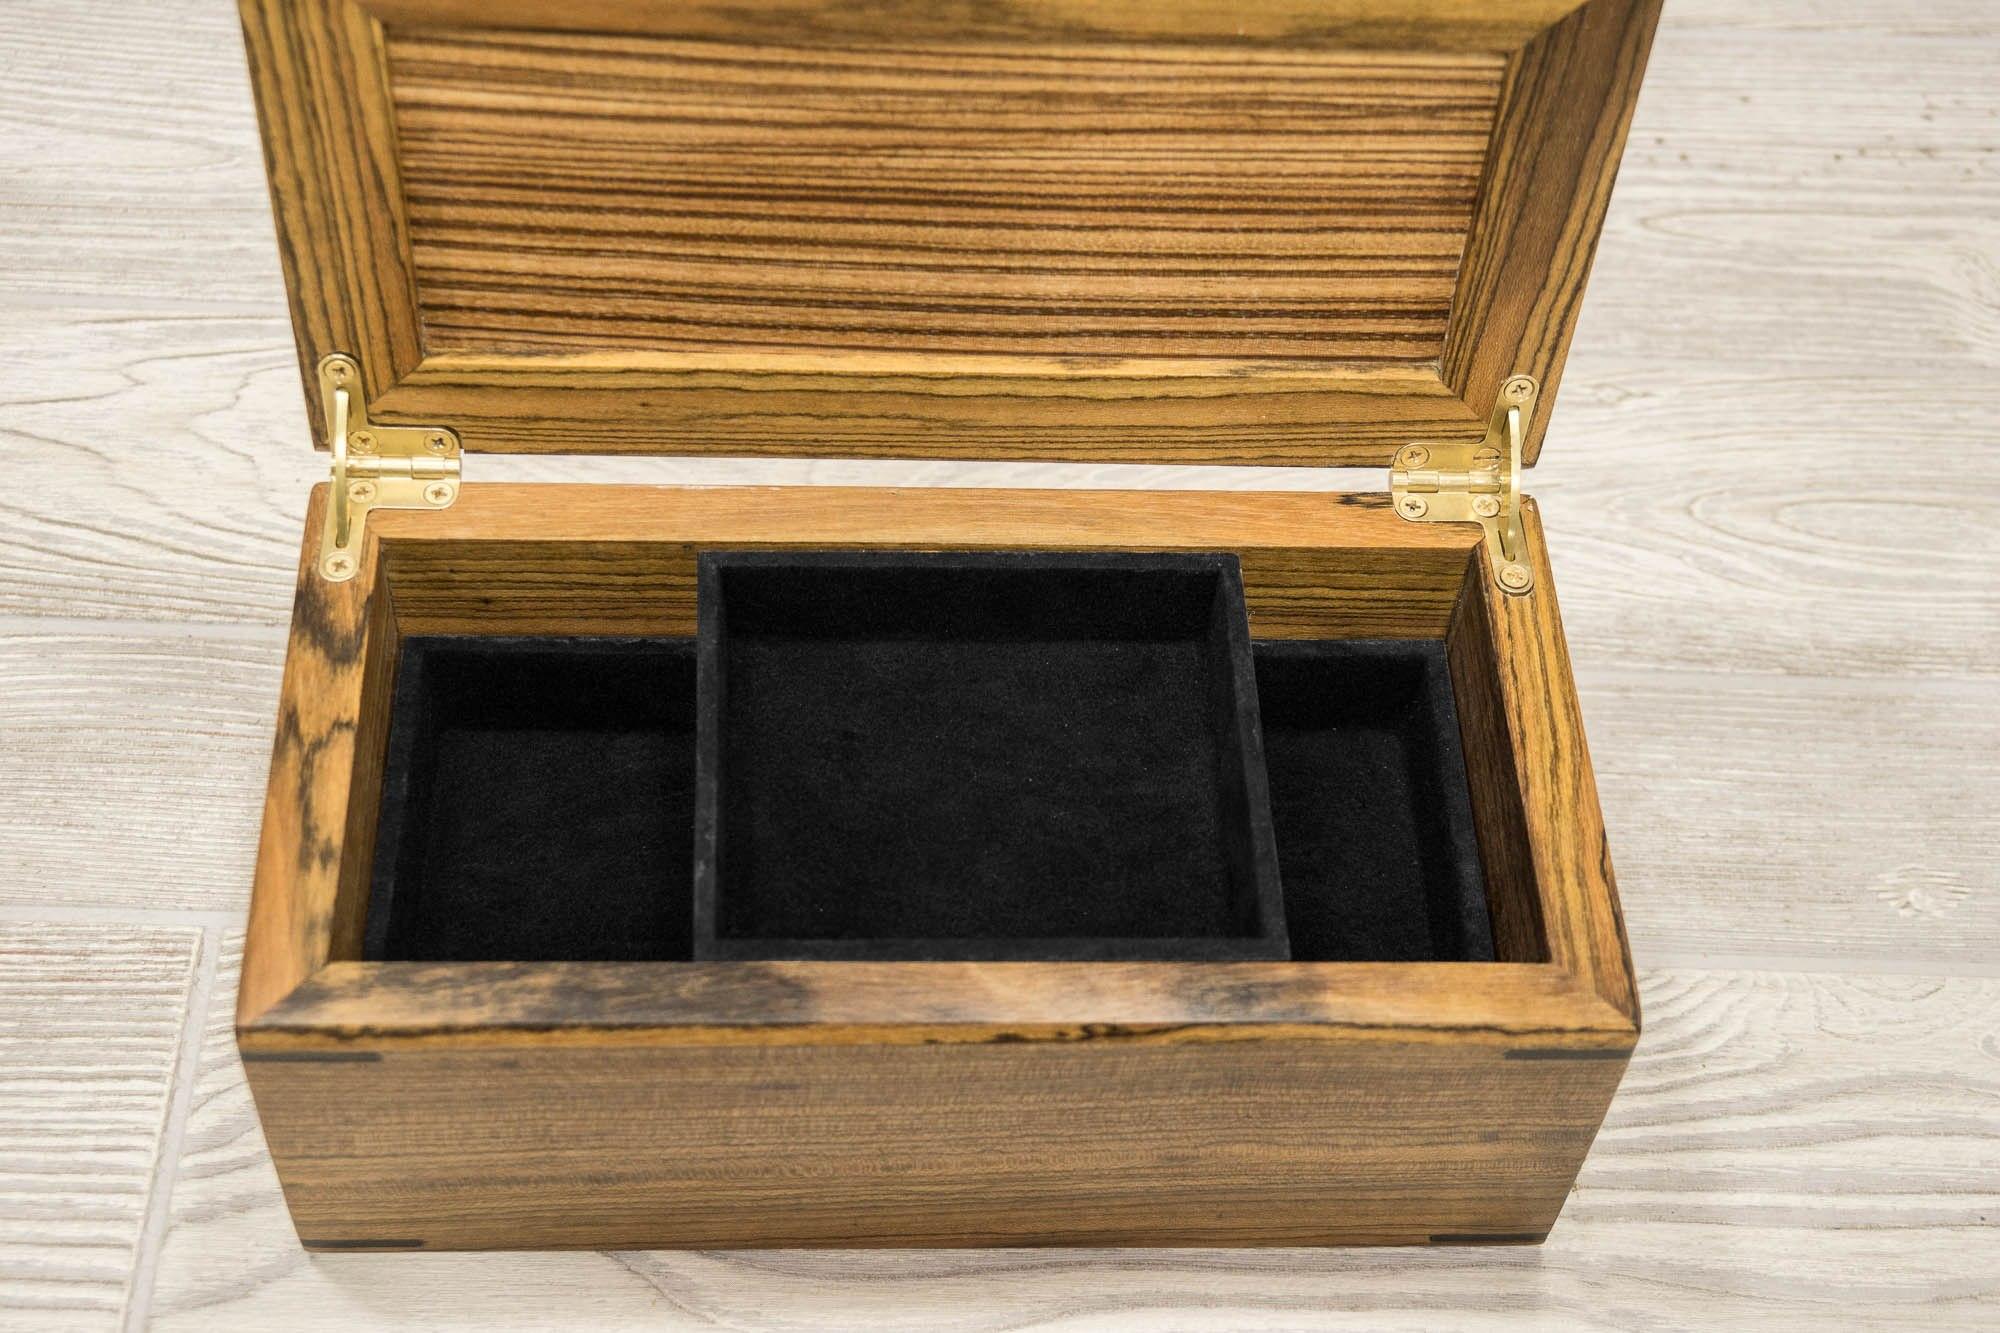 miter-box-03.jpg